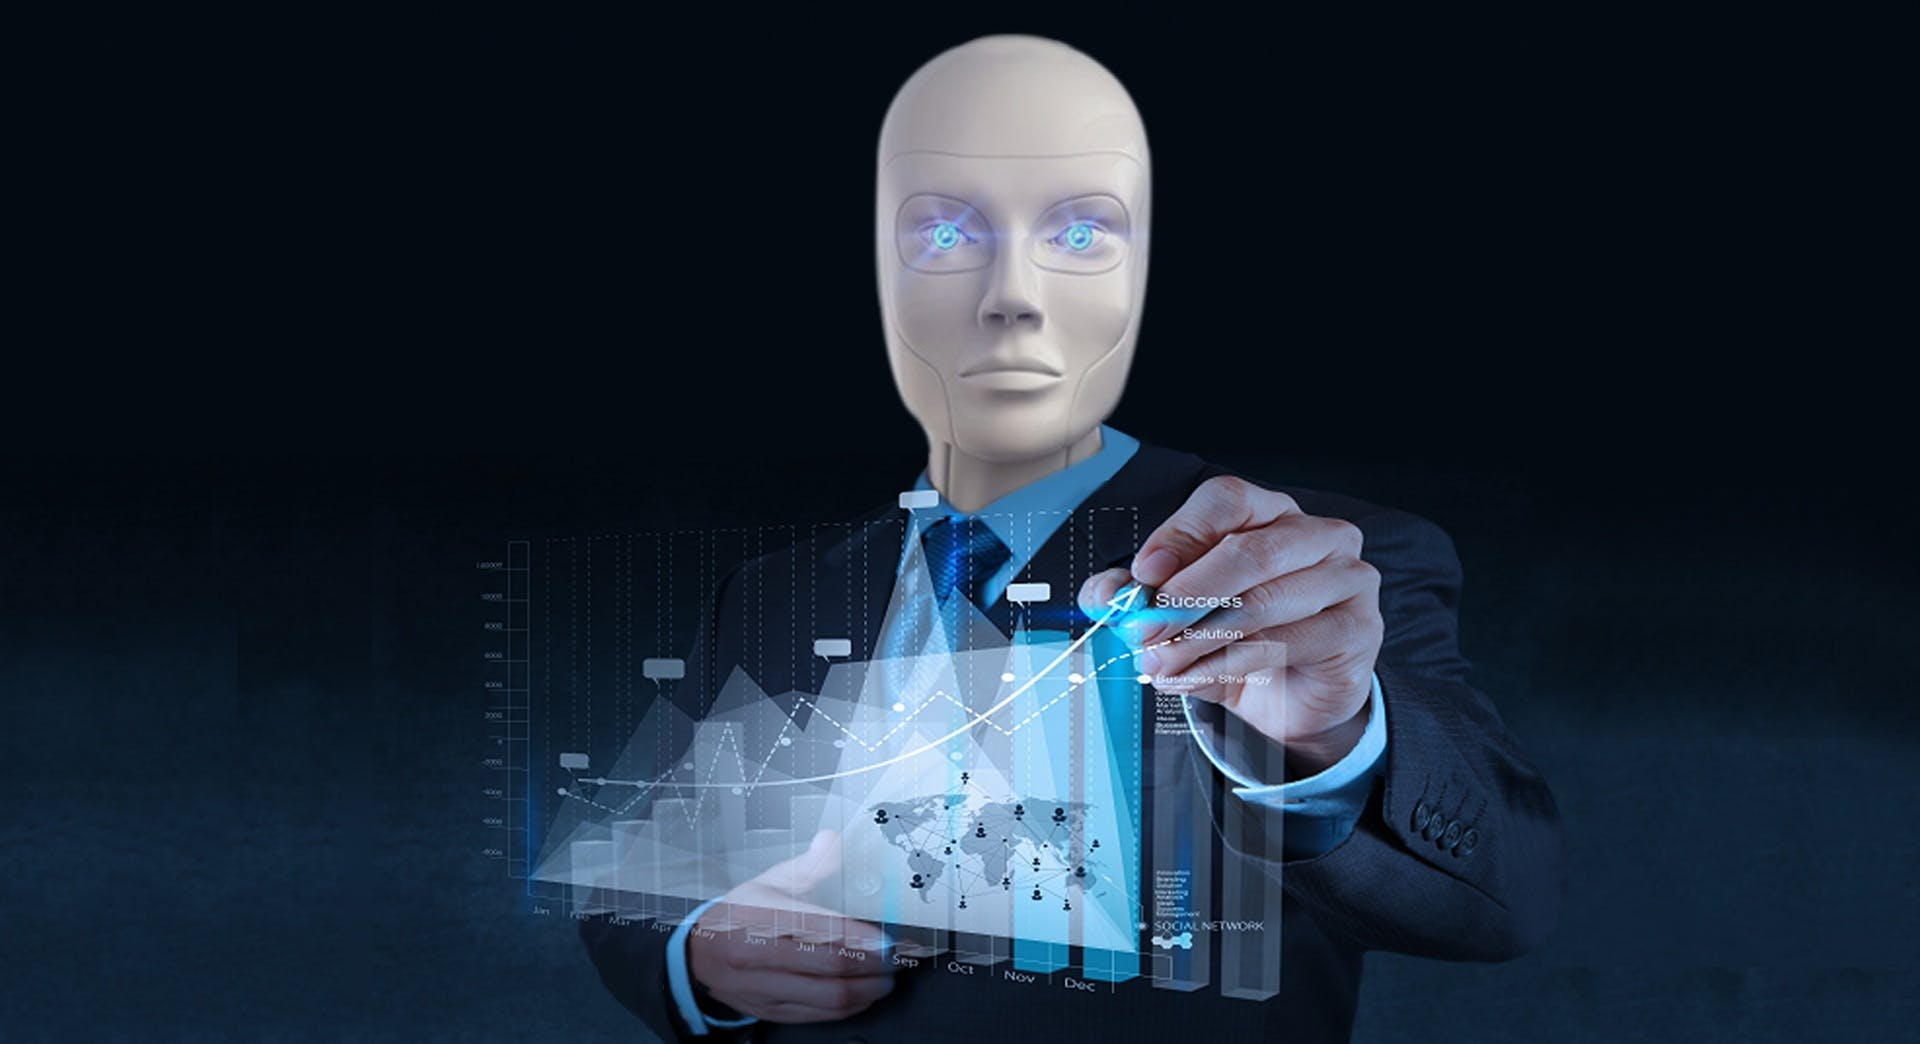 Titelbild-AI-Potenziale-Vertrieb-Sales-KI-Künstliche-Intelligenz-pixabay-3262759-sujins